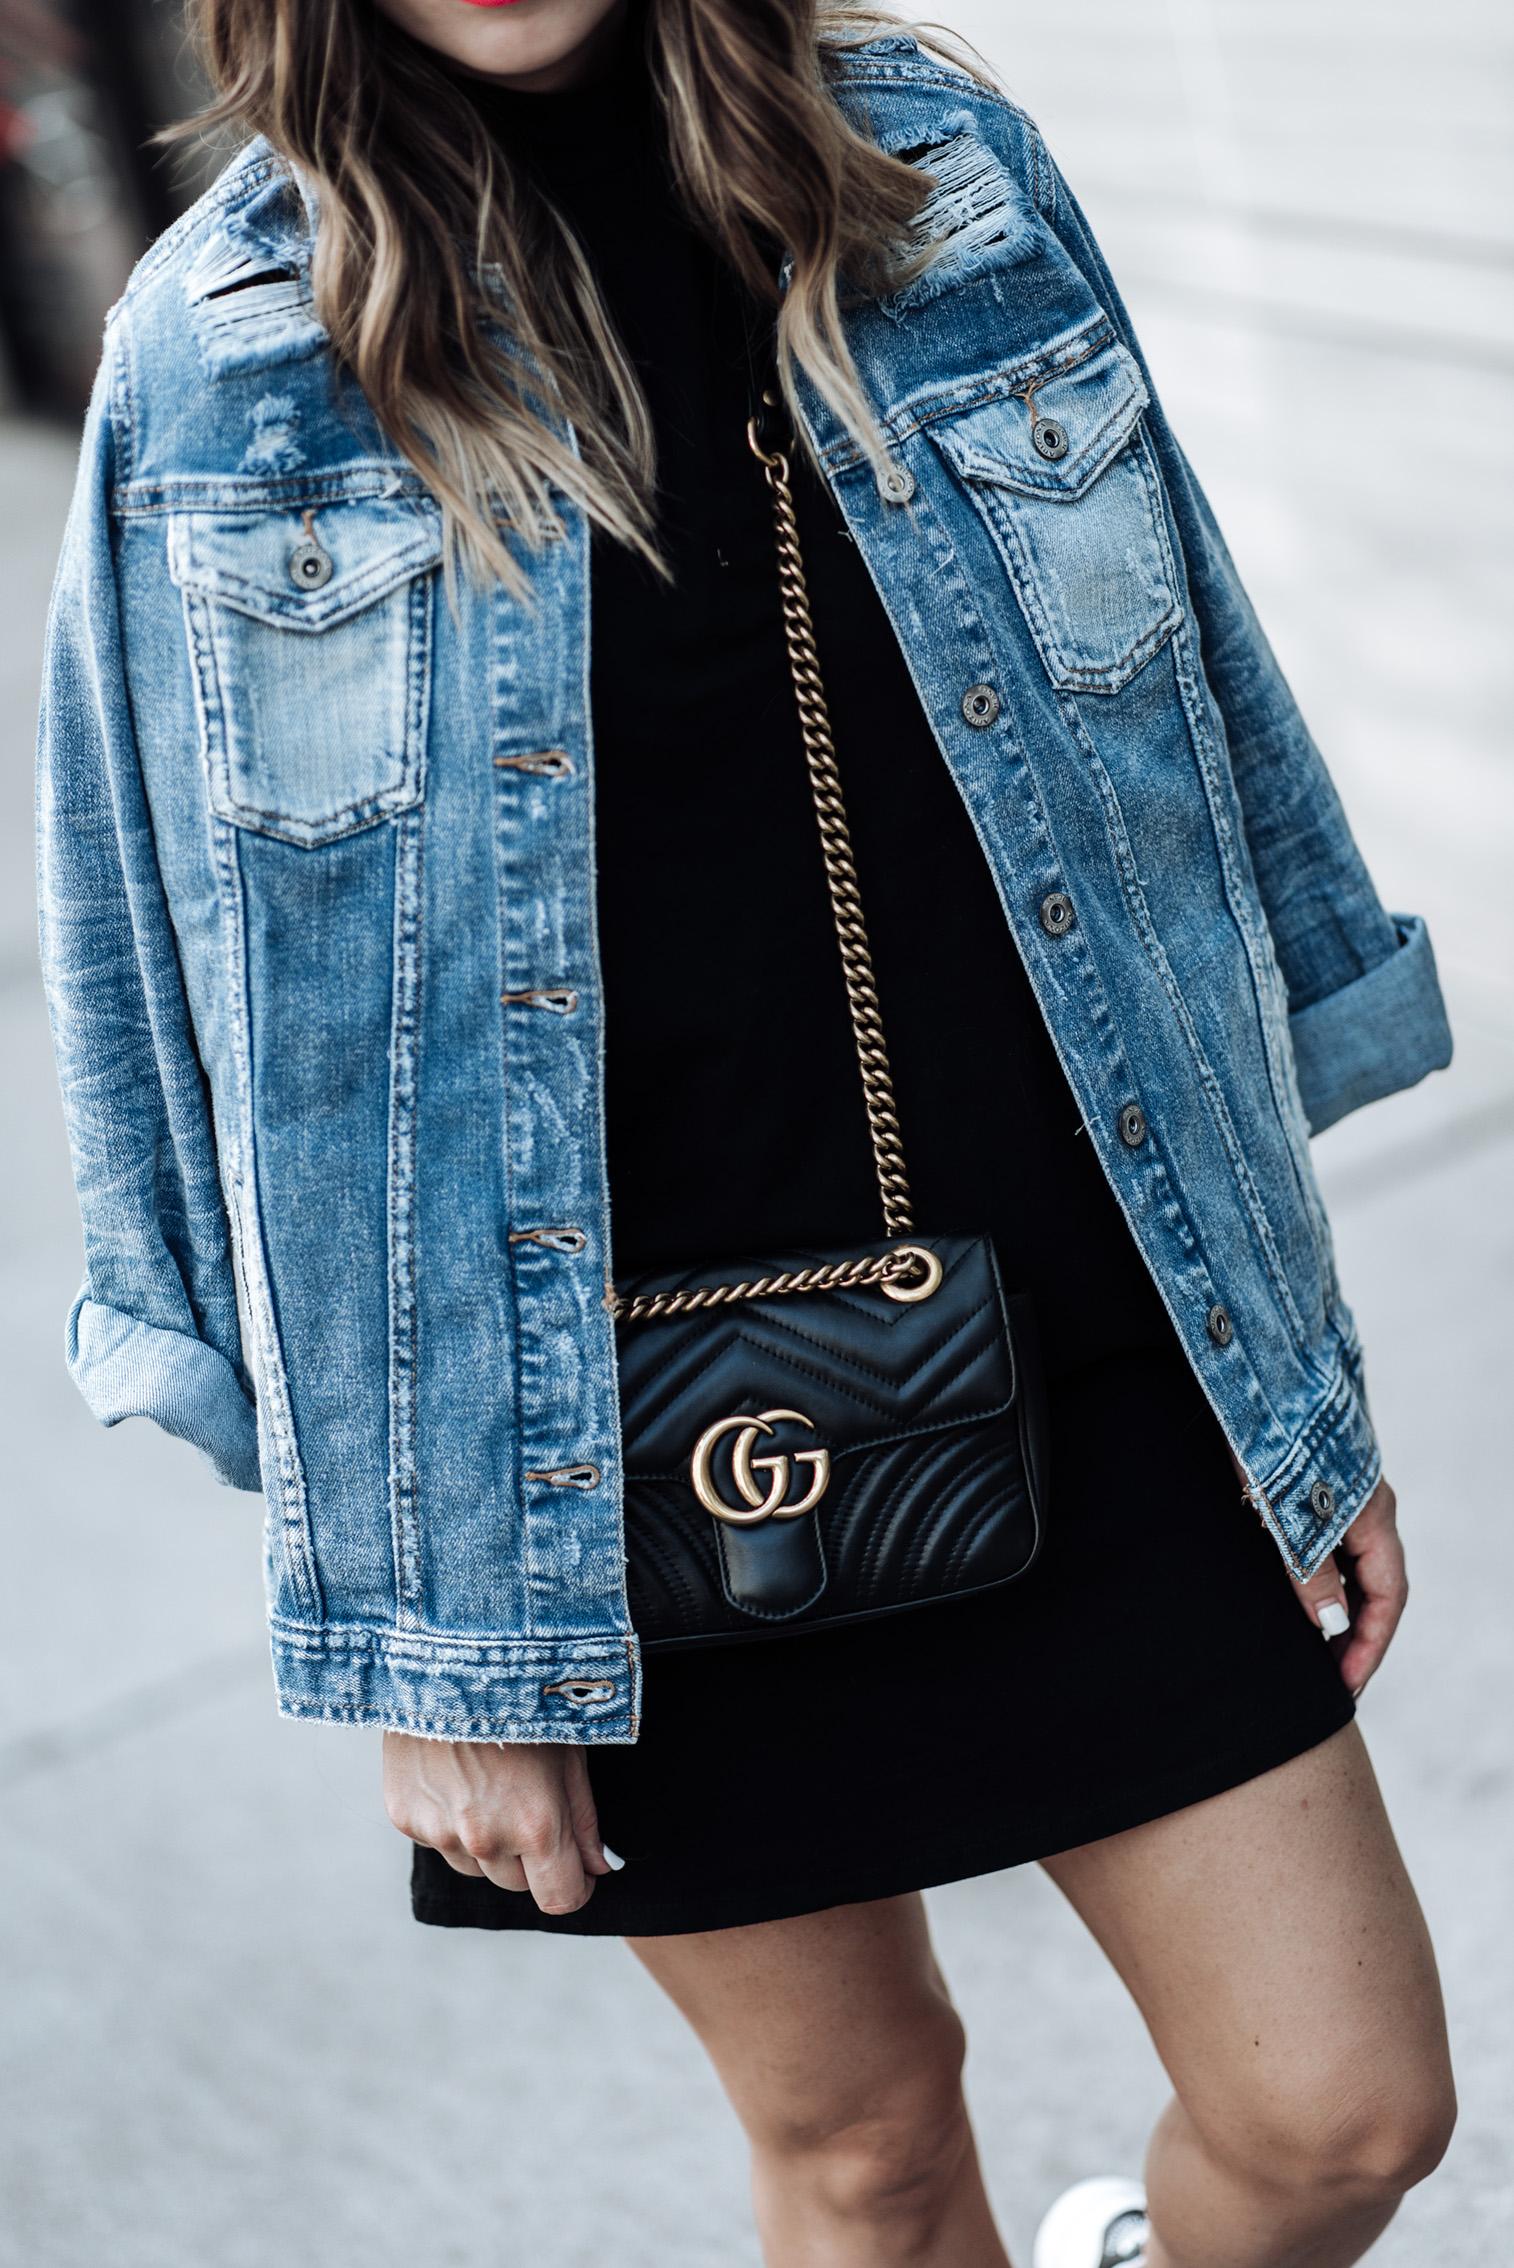 Currently trending / oversized denim jacket   Arizona Oversized Denim Jacket   Mock NeckDress   Stan Smith Sneakers   Gucci Marmot Bag  Watch   Houston fashion blogger, street style fashion 2017